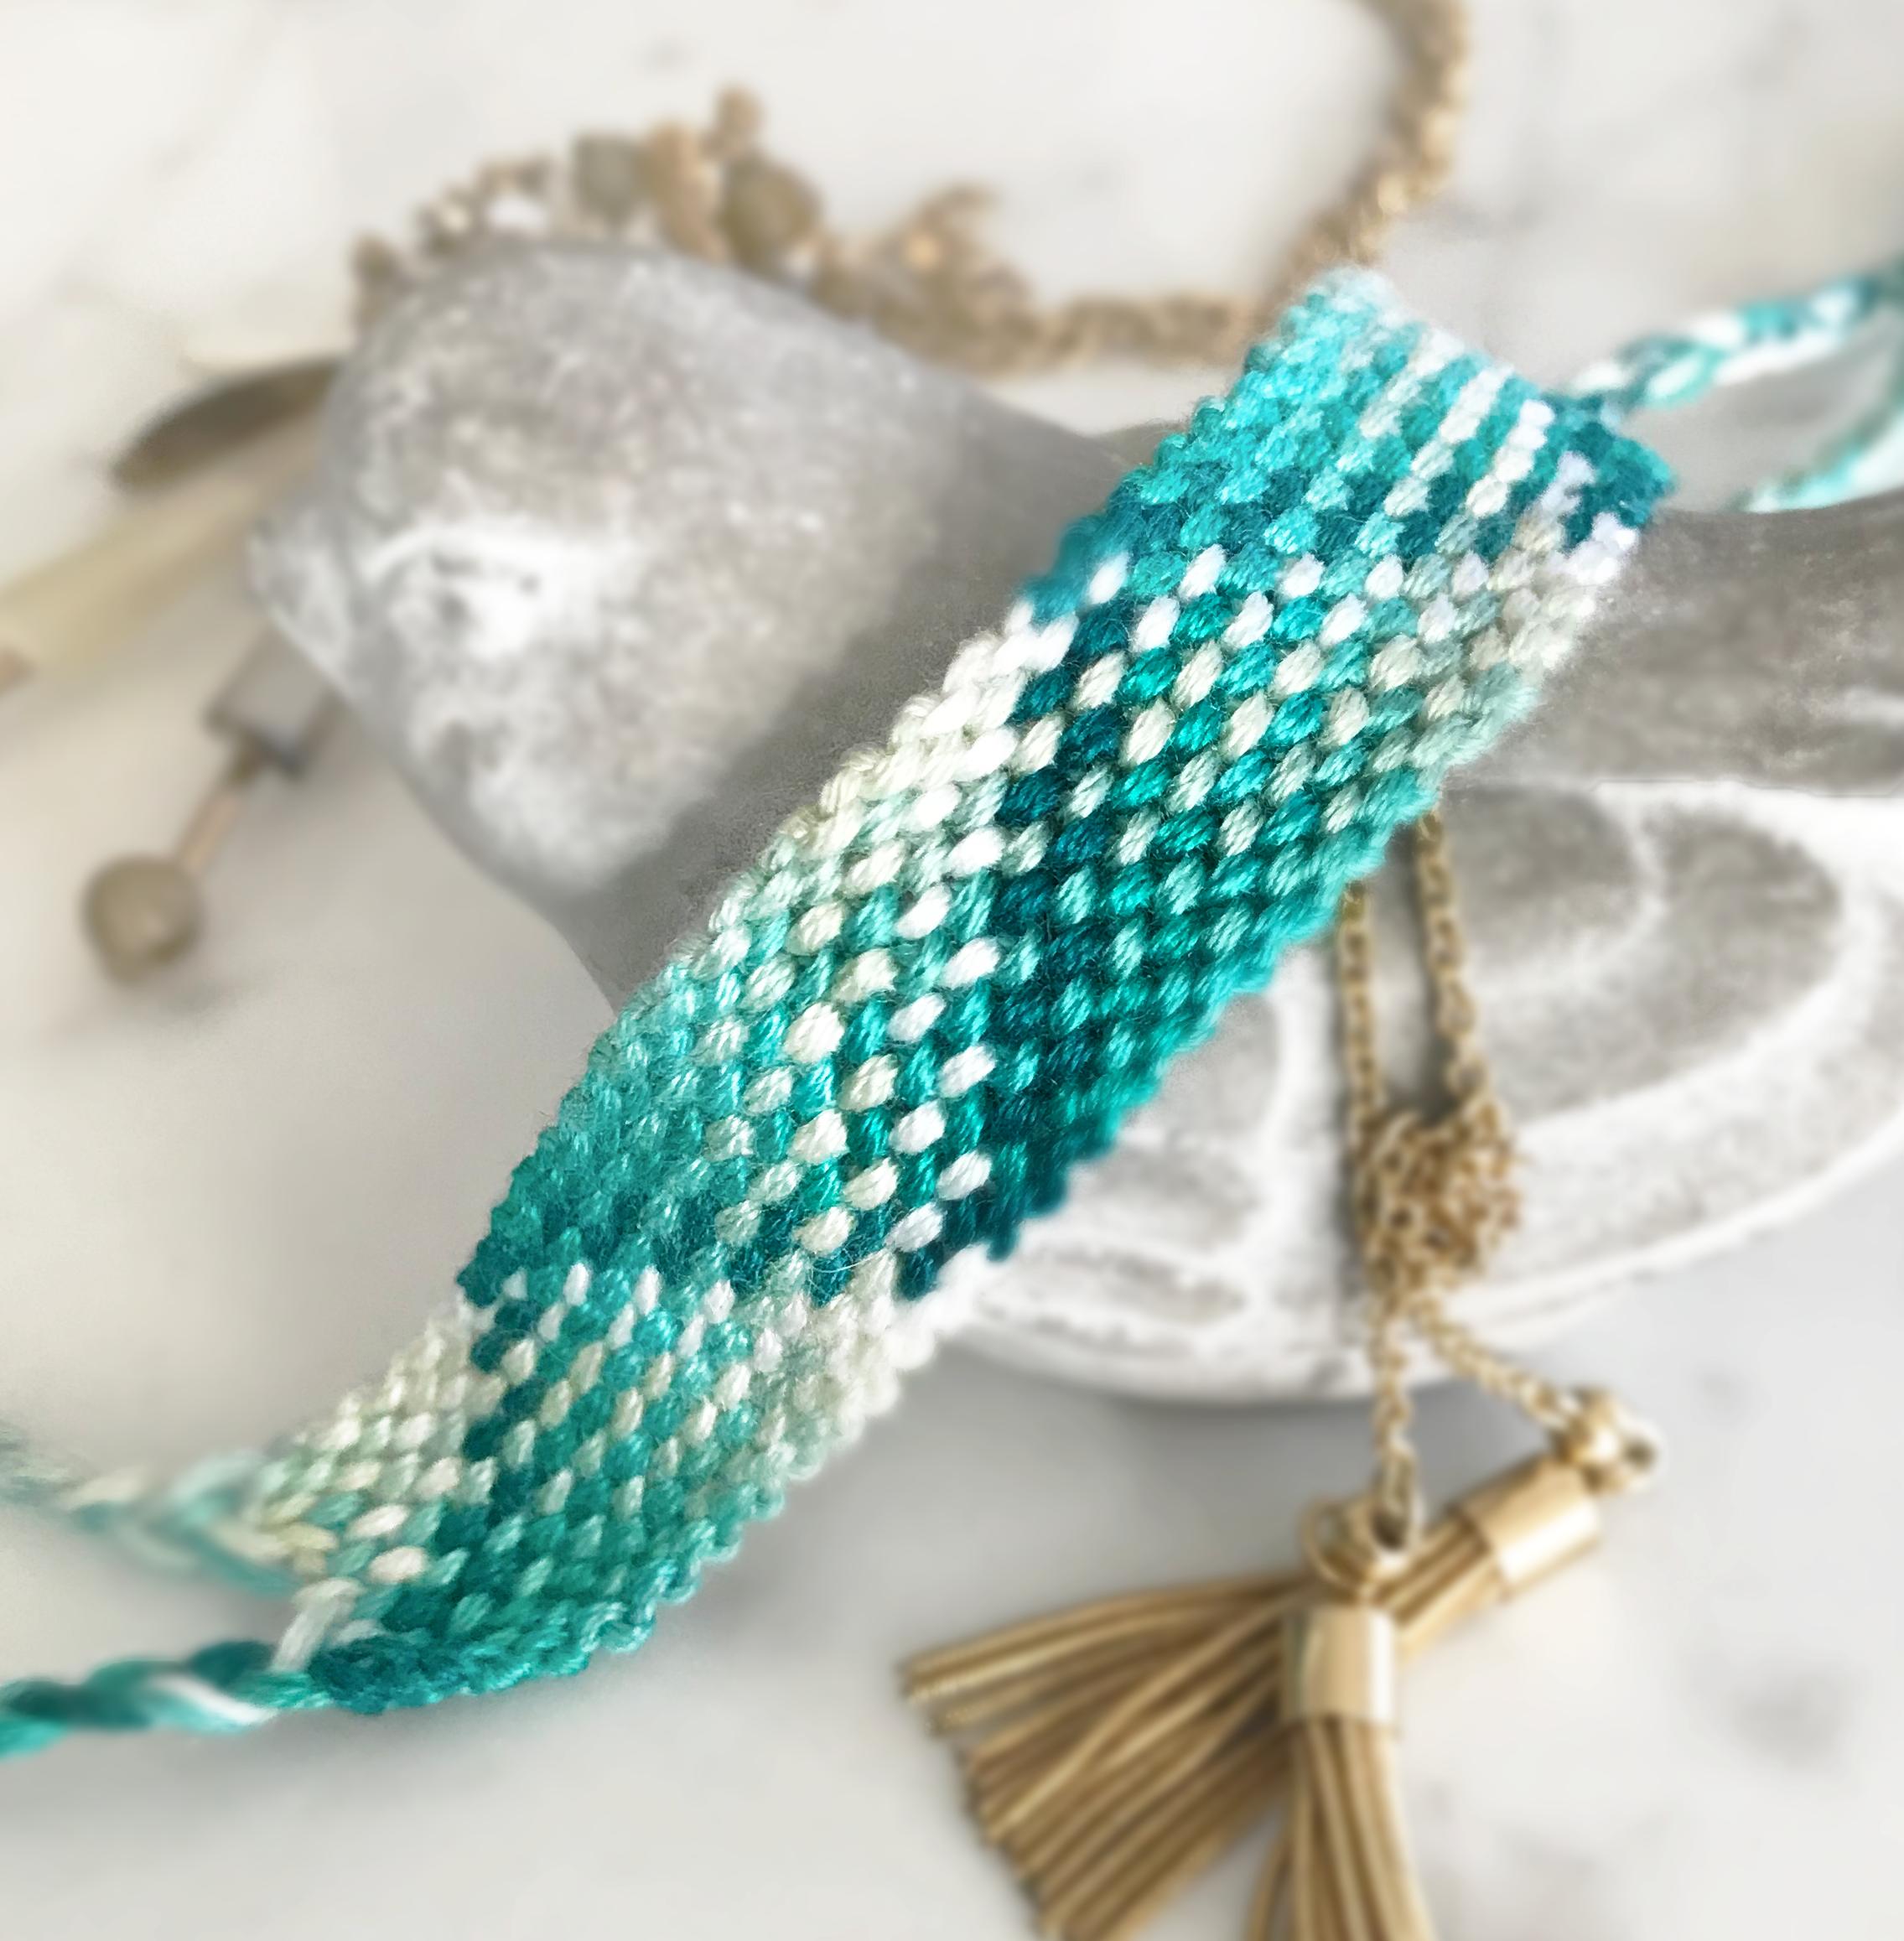 39d21779b3c04 Seascape Friendship Bracelet - DIY Kit | Products | Embroidery ...